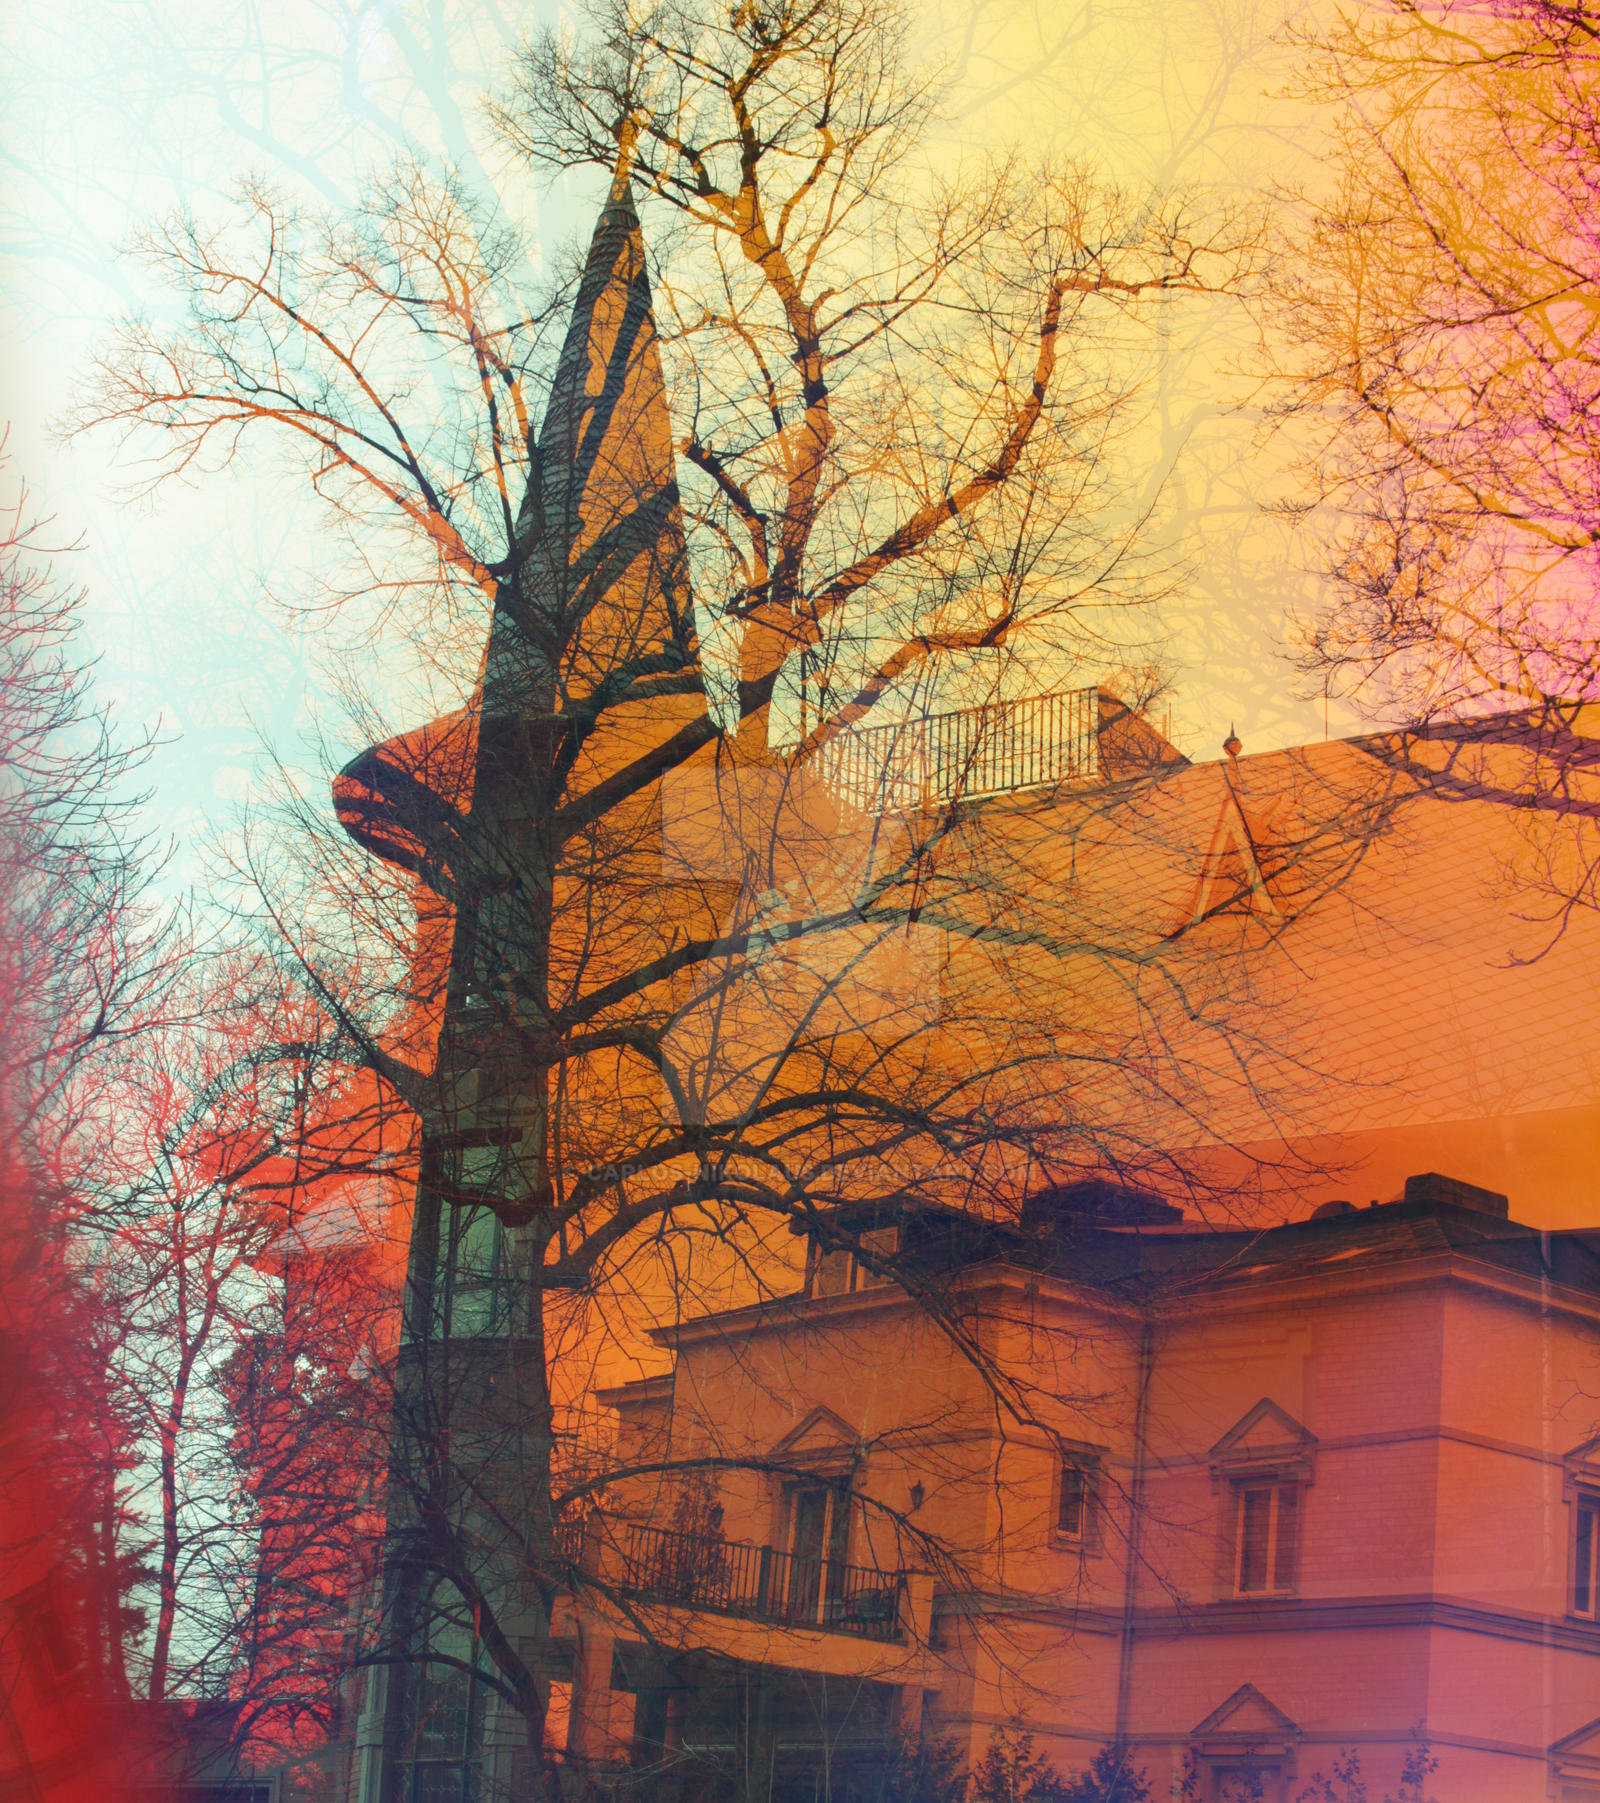 Villa Anna and residence by carlos-nikolaus